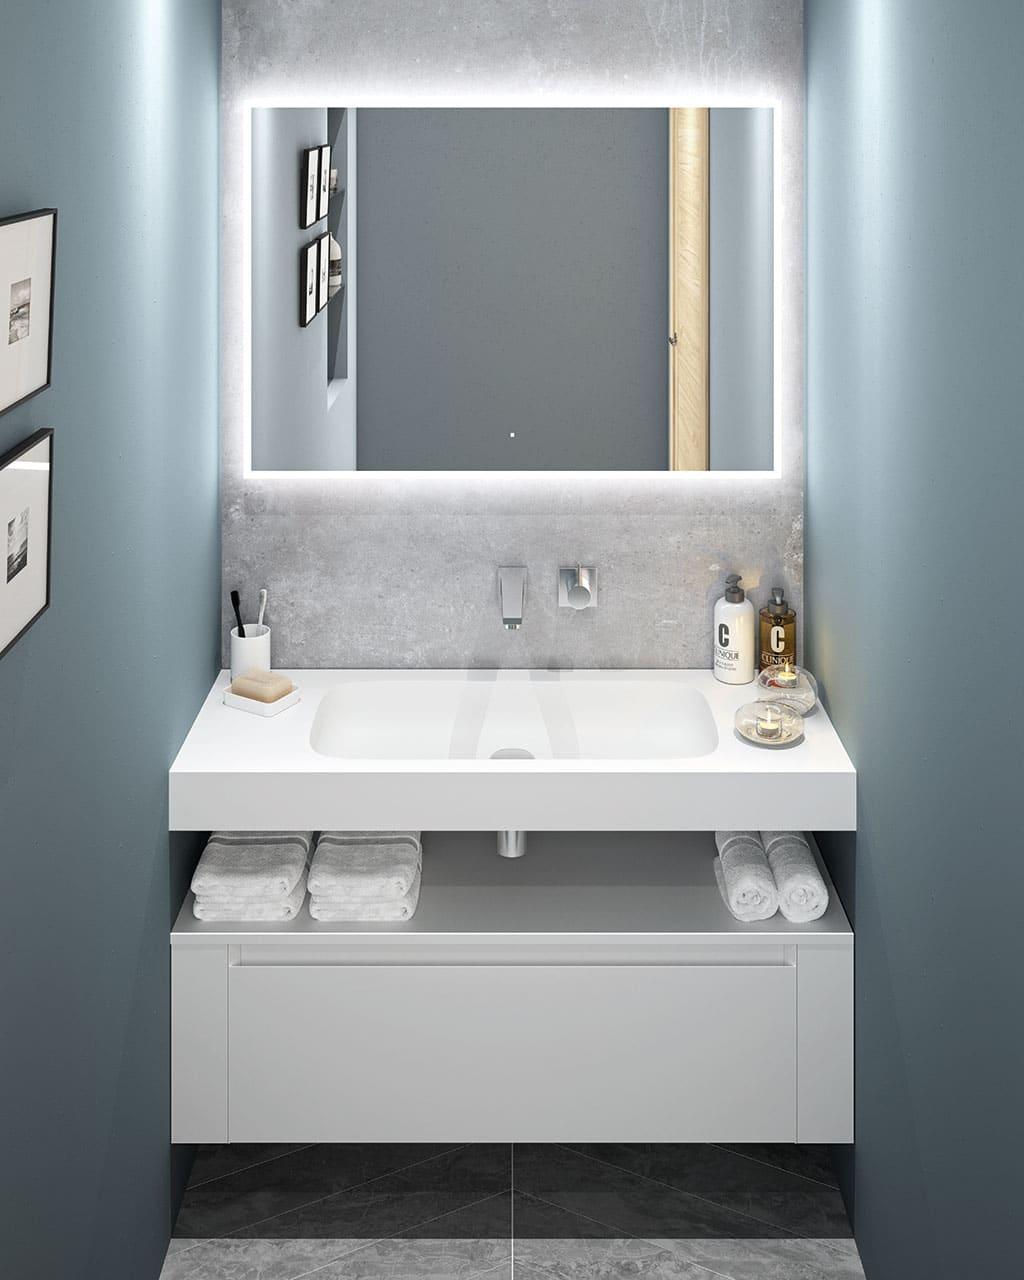 Style Waschtischplatte